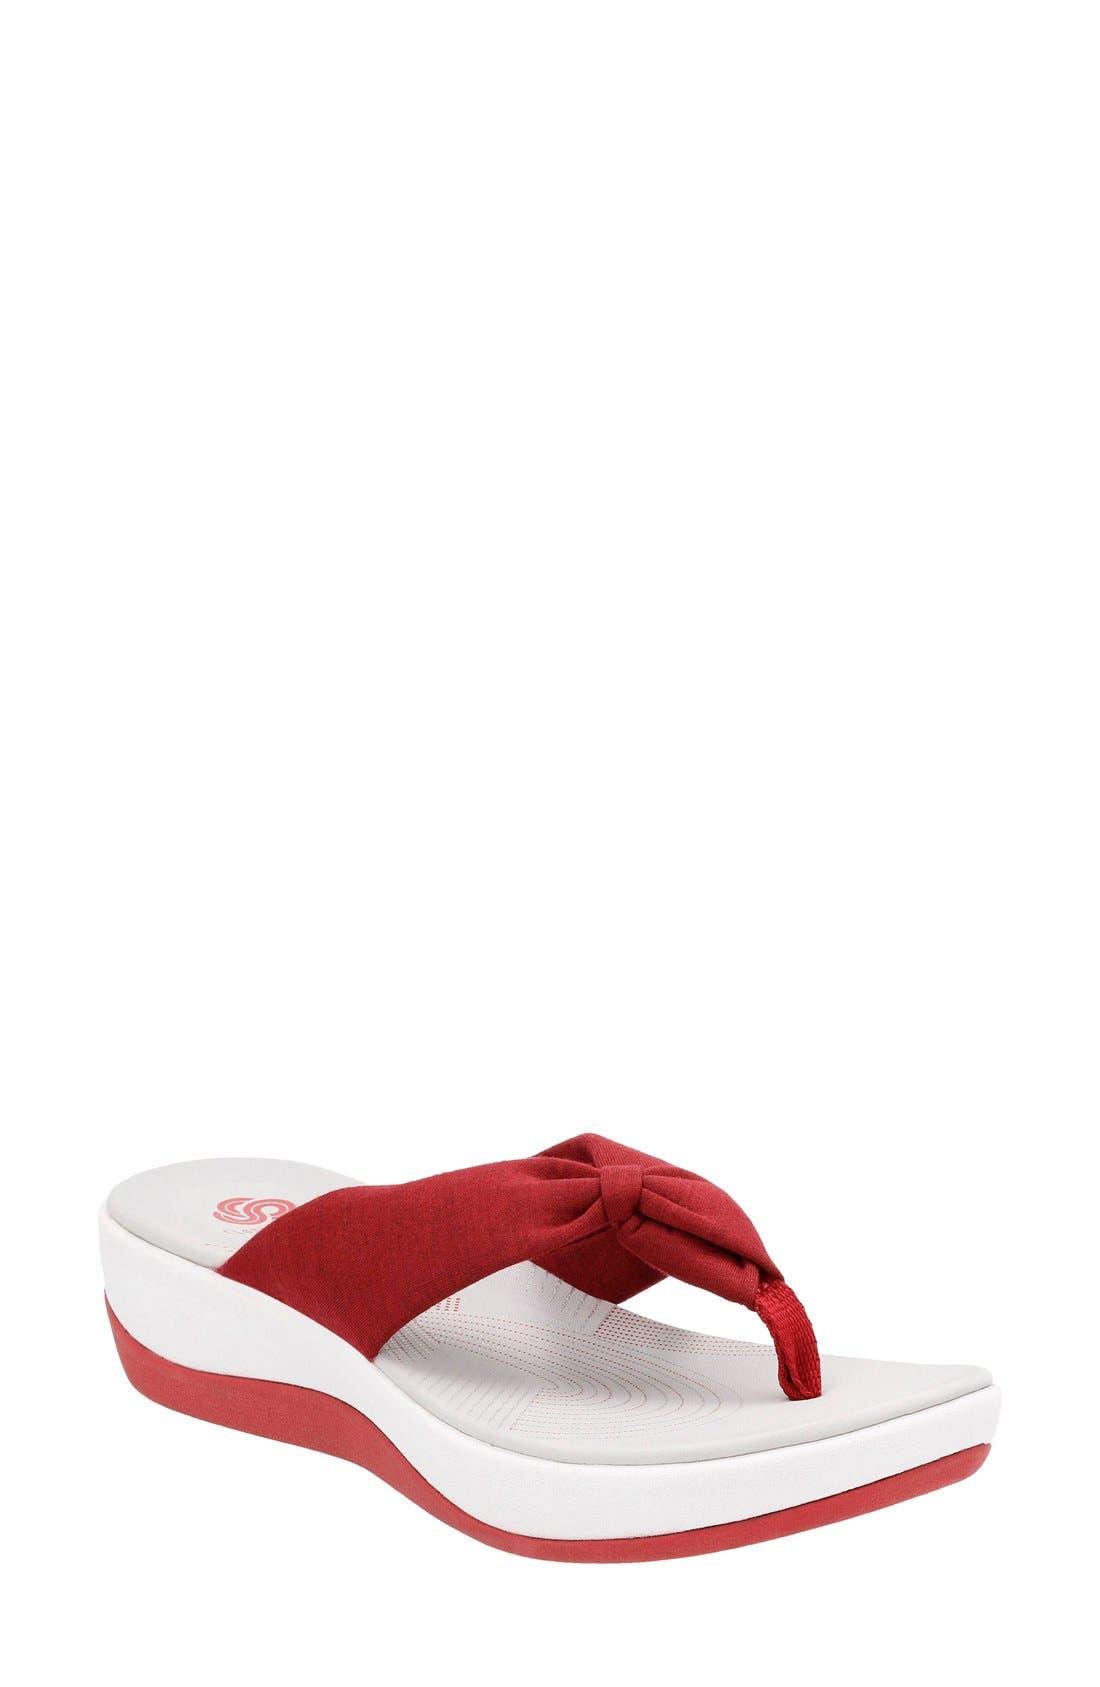 Arla Glison Flip Flop,                         Main,                         color, Red Fabric